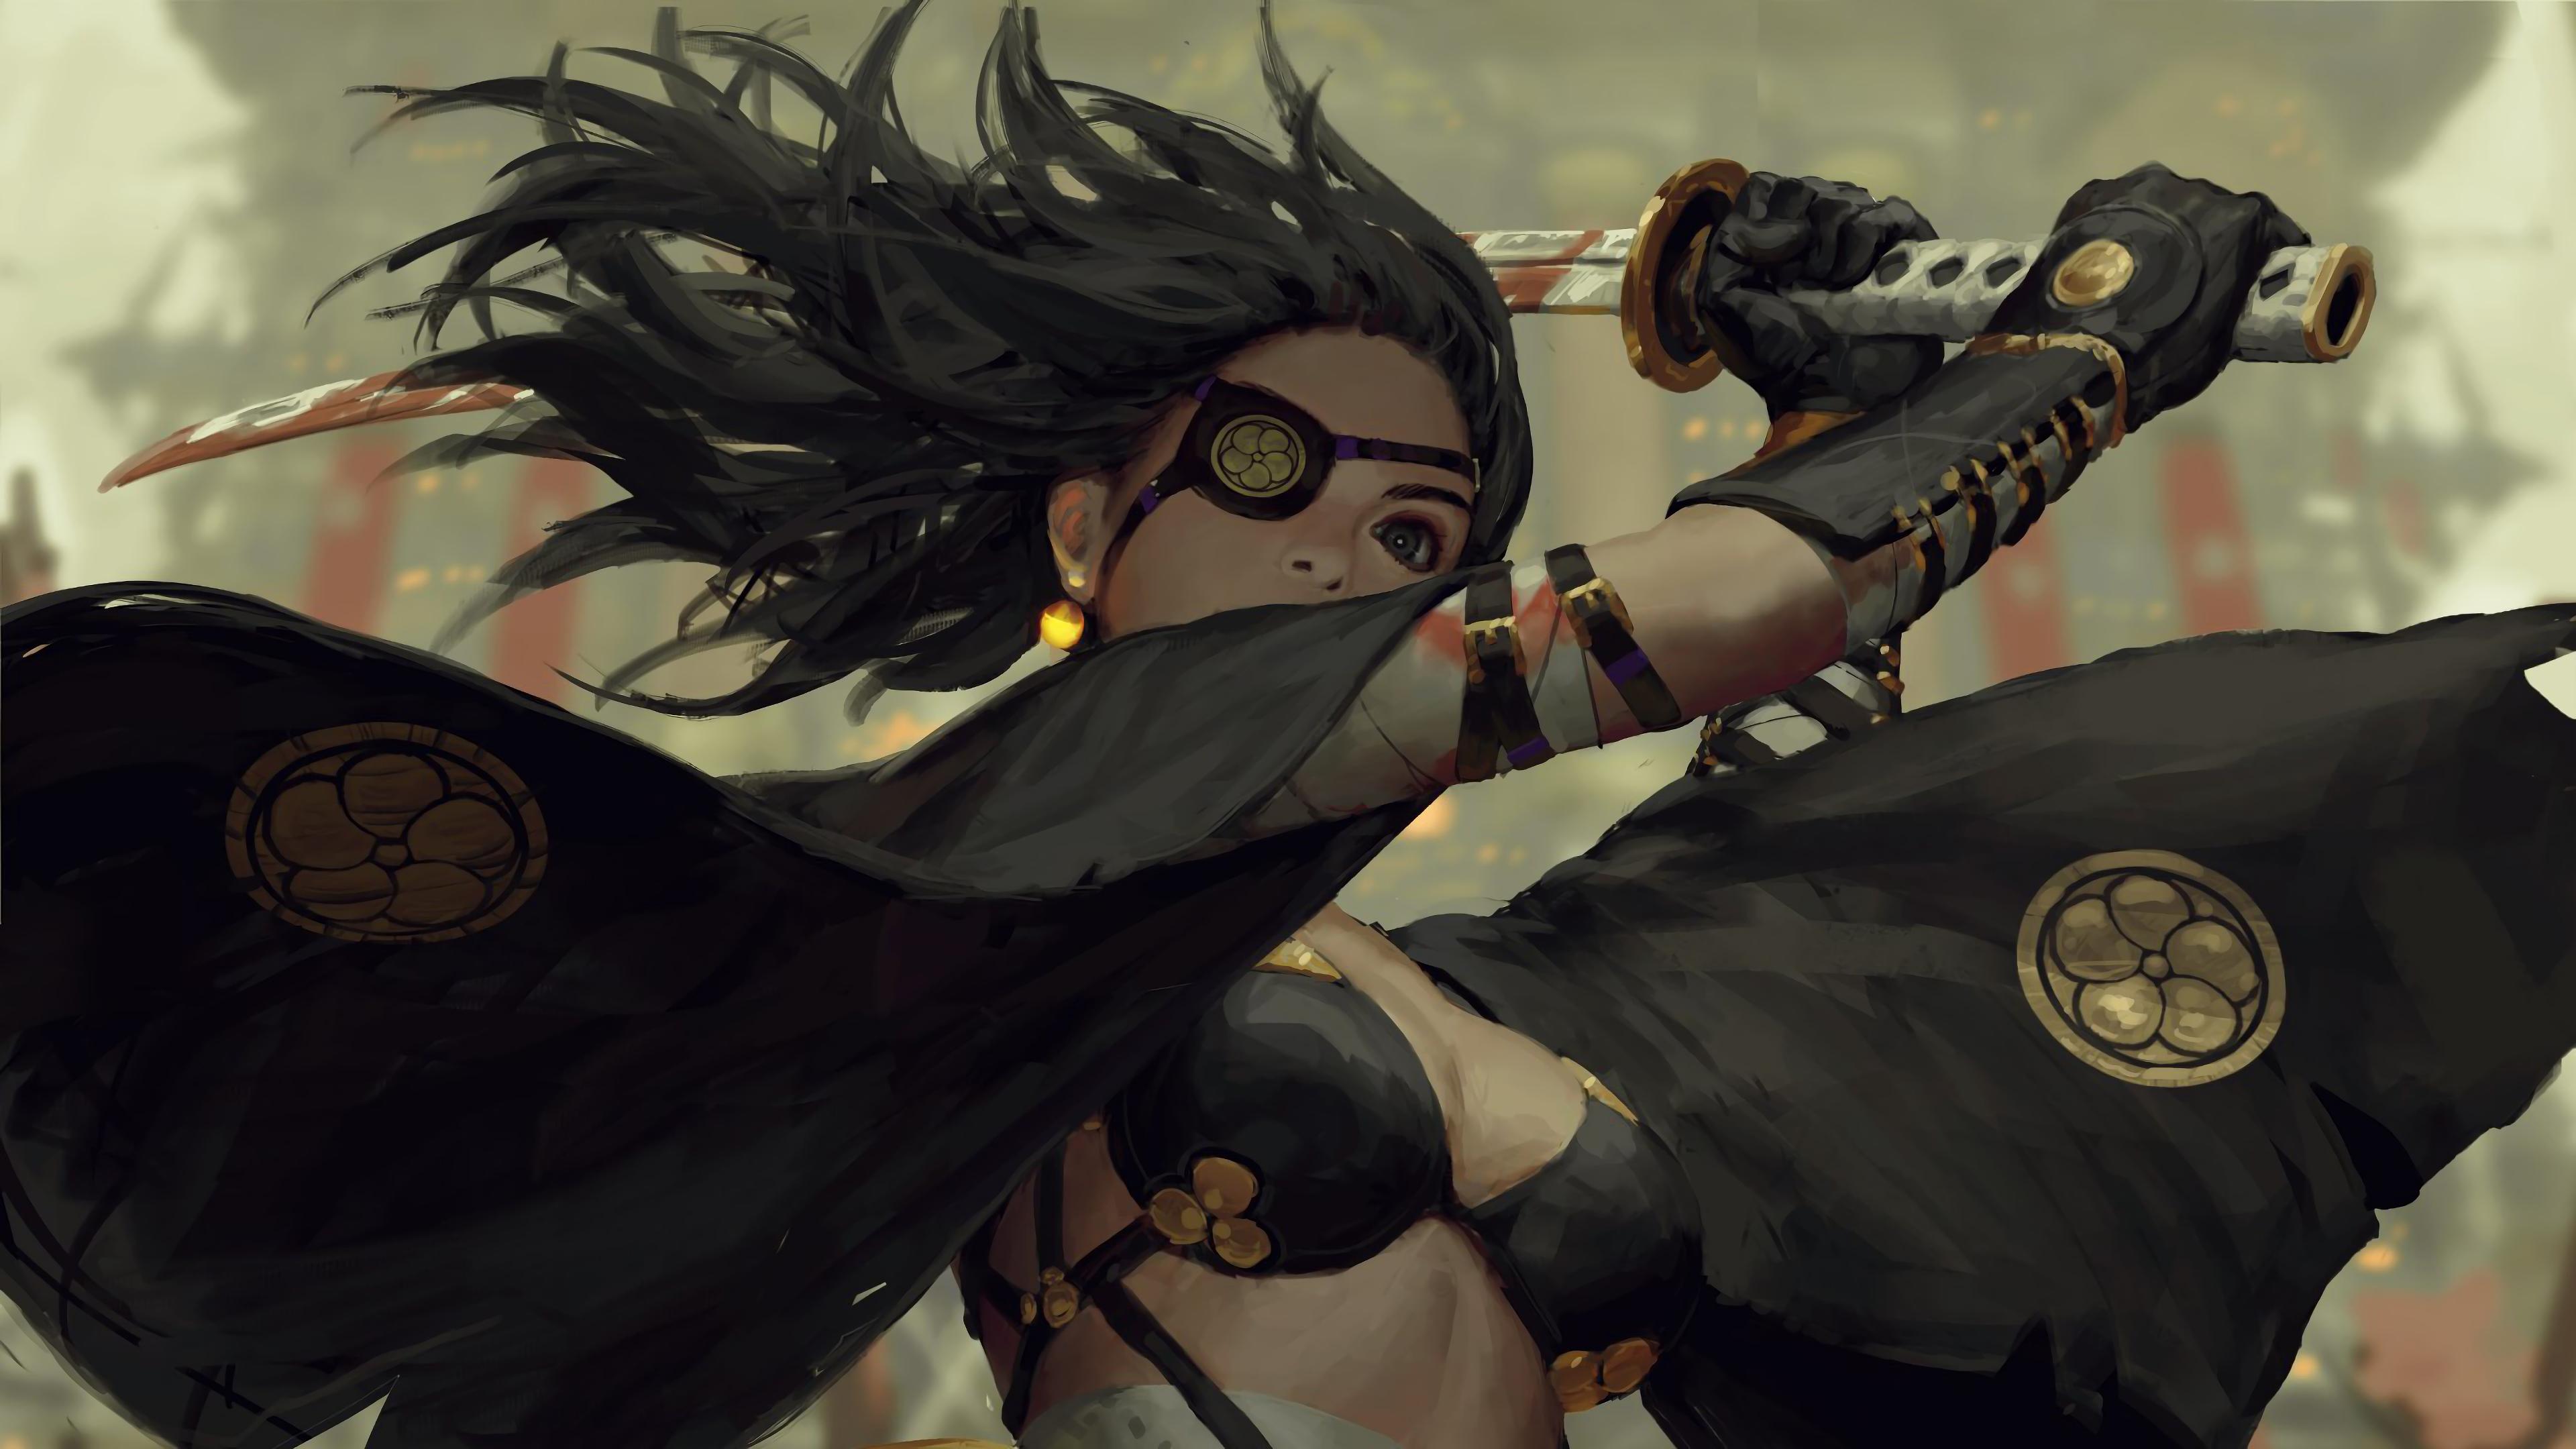 Samurai Girl Katana Fantasy Art 4k Wallpaper 95